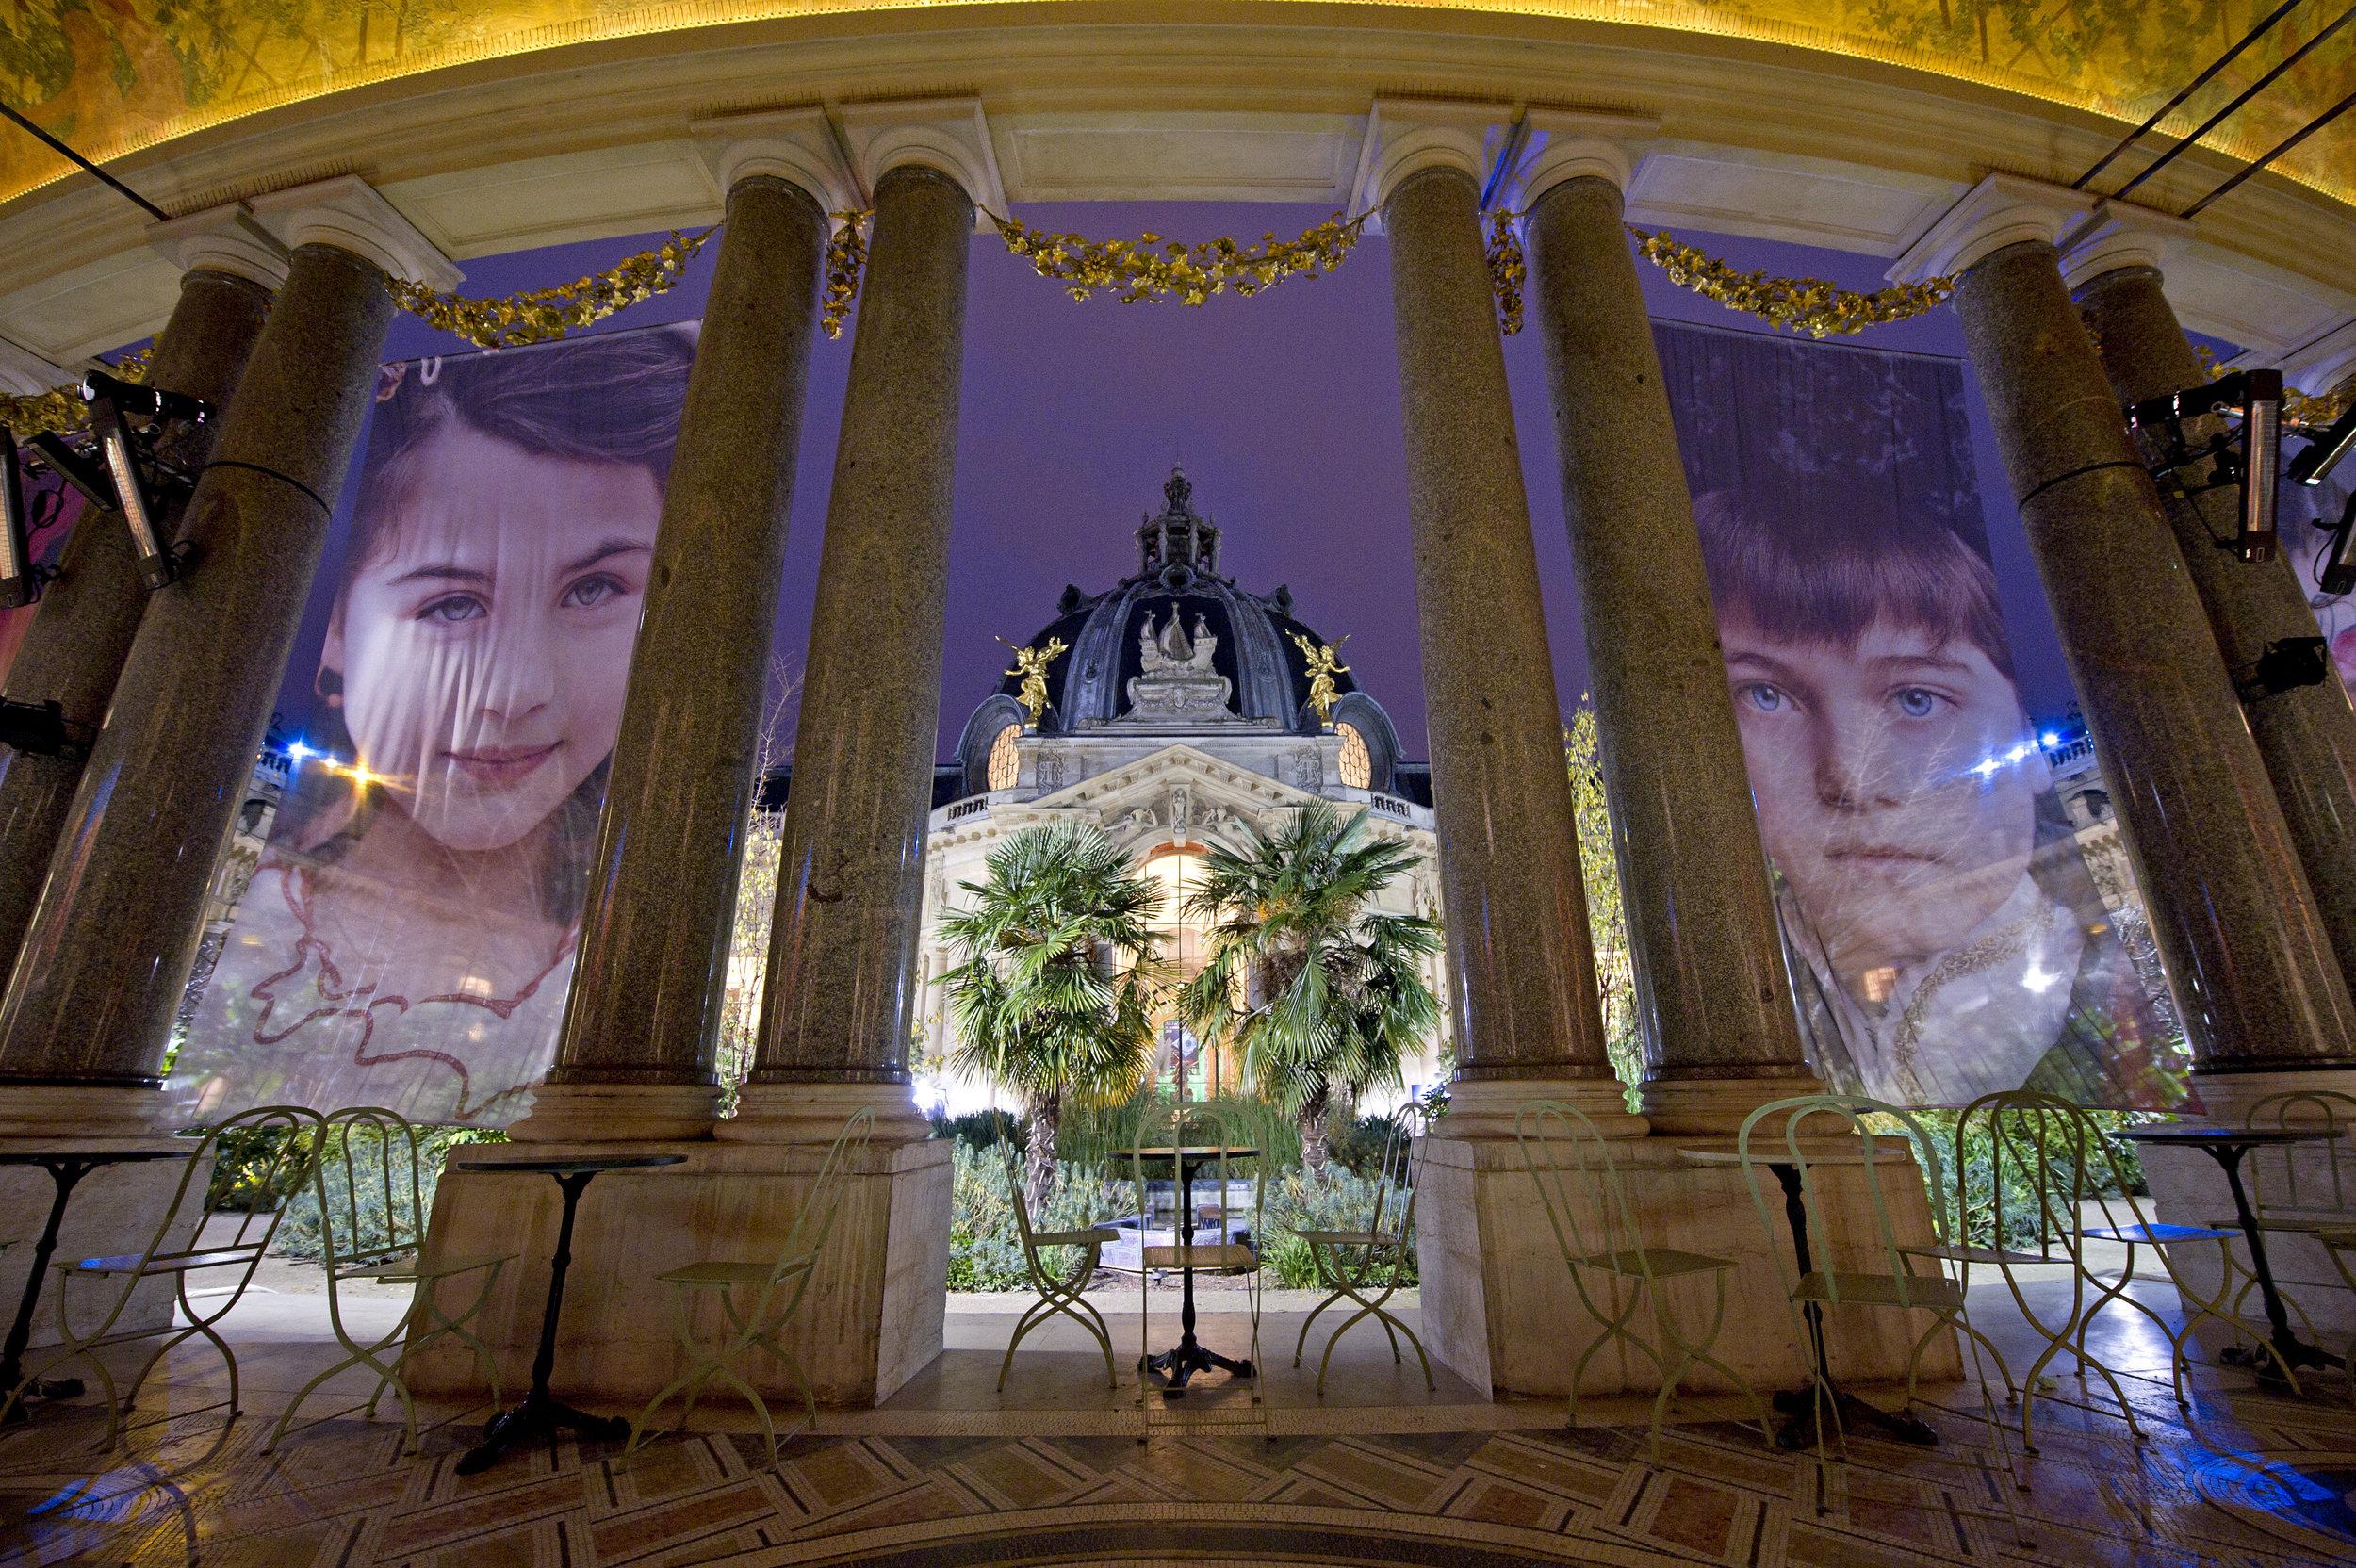 Reza Petit Palais032.jpg